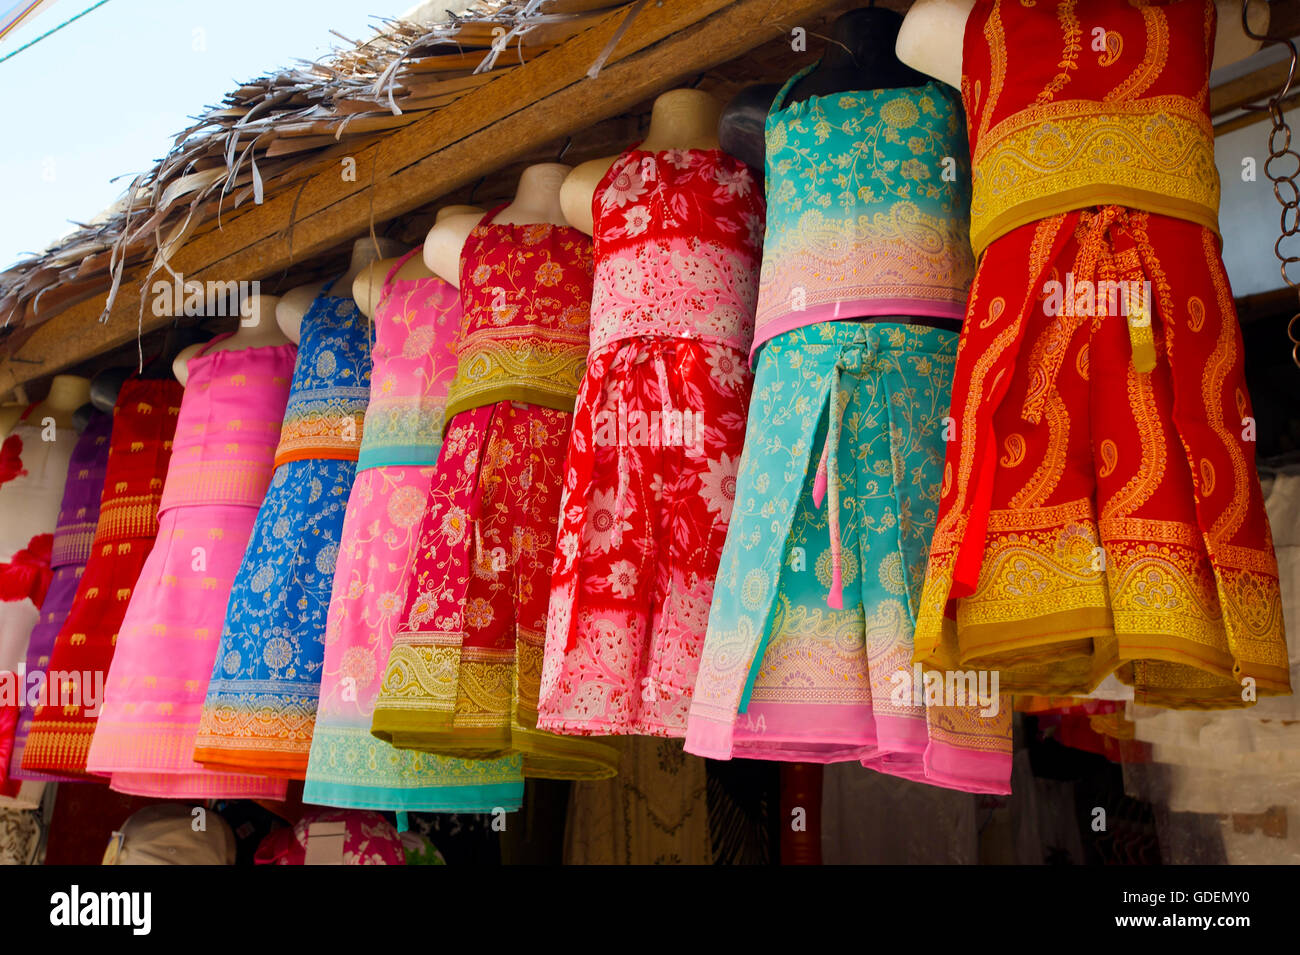 Shop at Lamai Beach, Ko Samui Island, Thailand - Stock Image